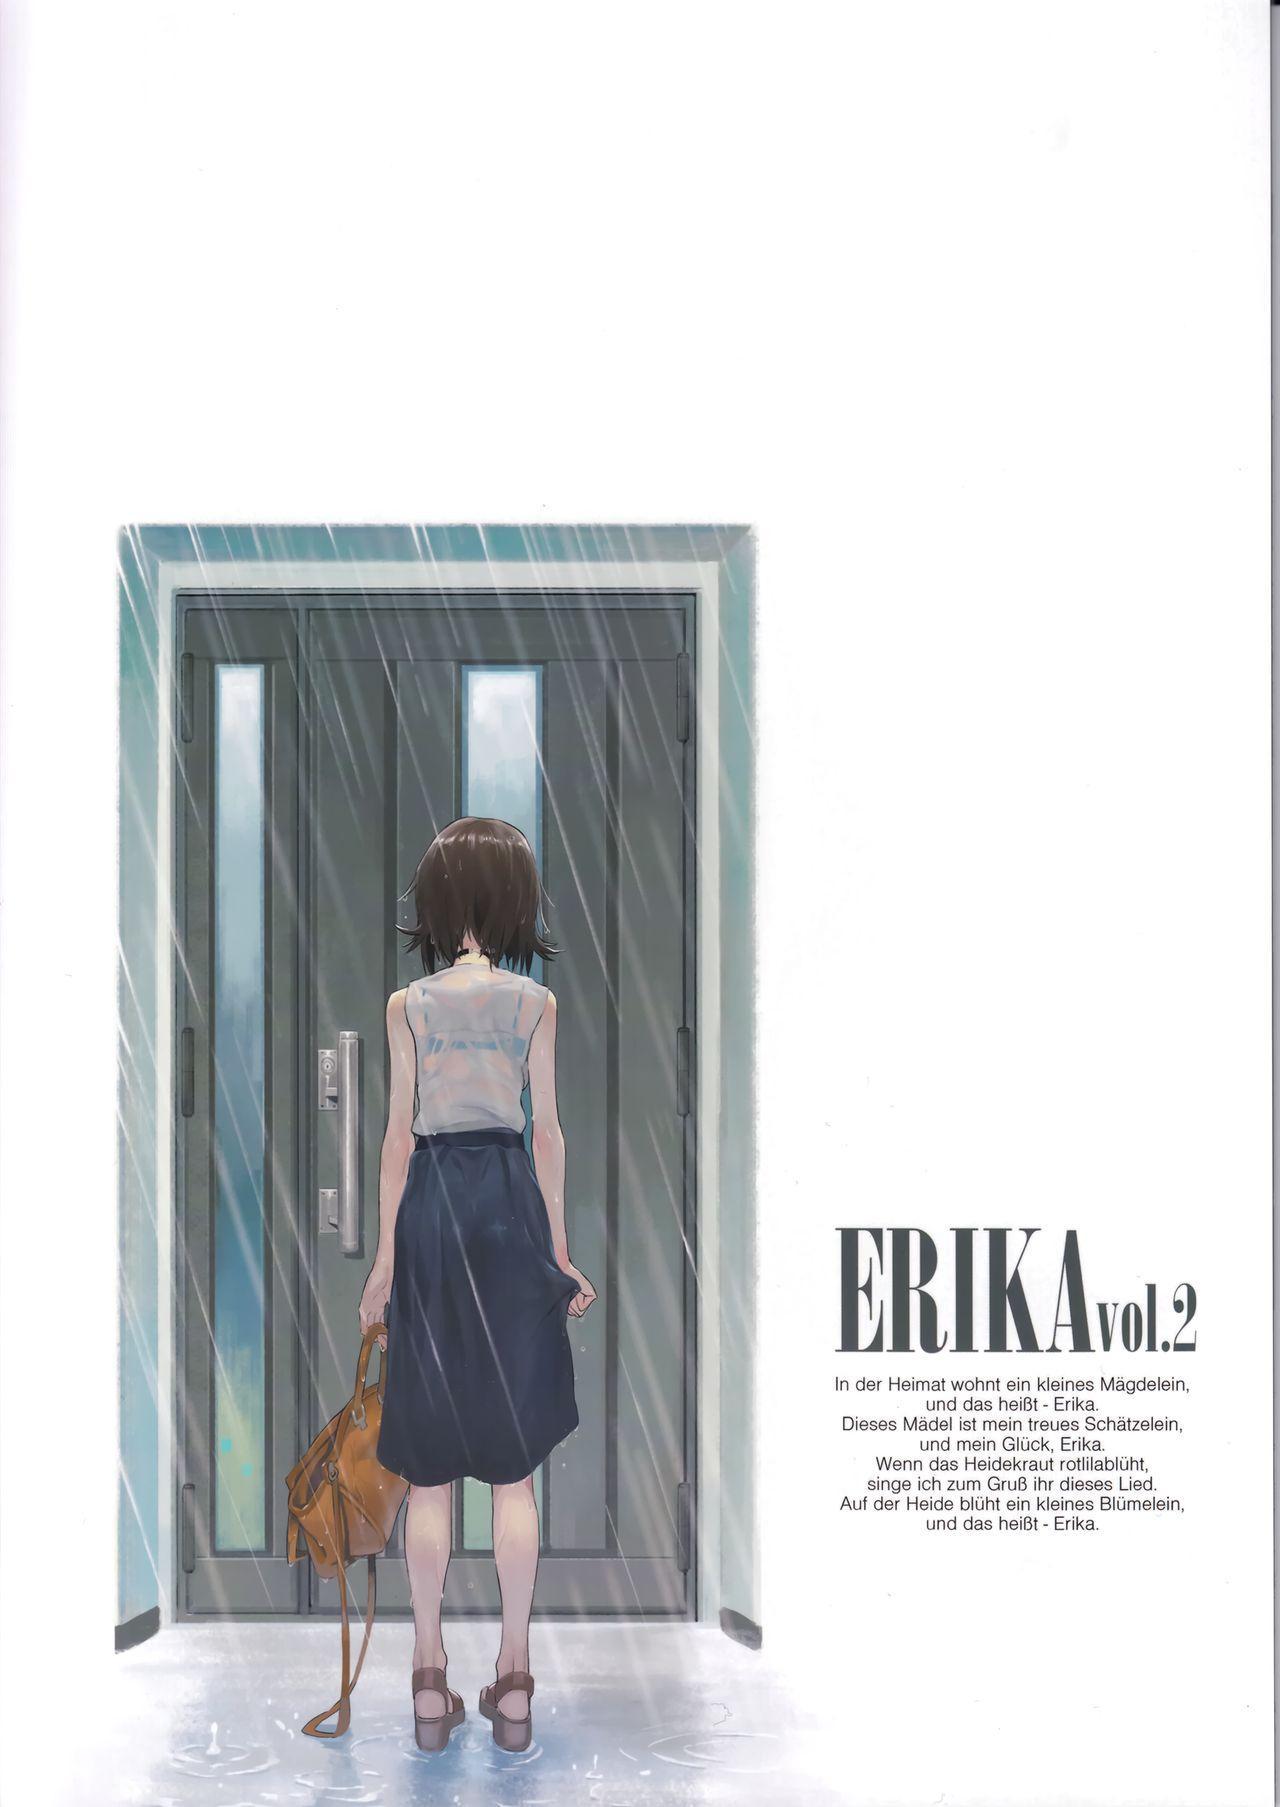 ERIKA Vol. 2 1